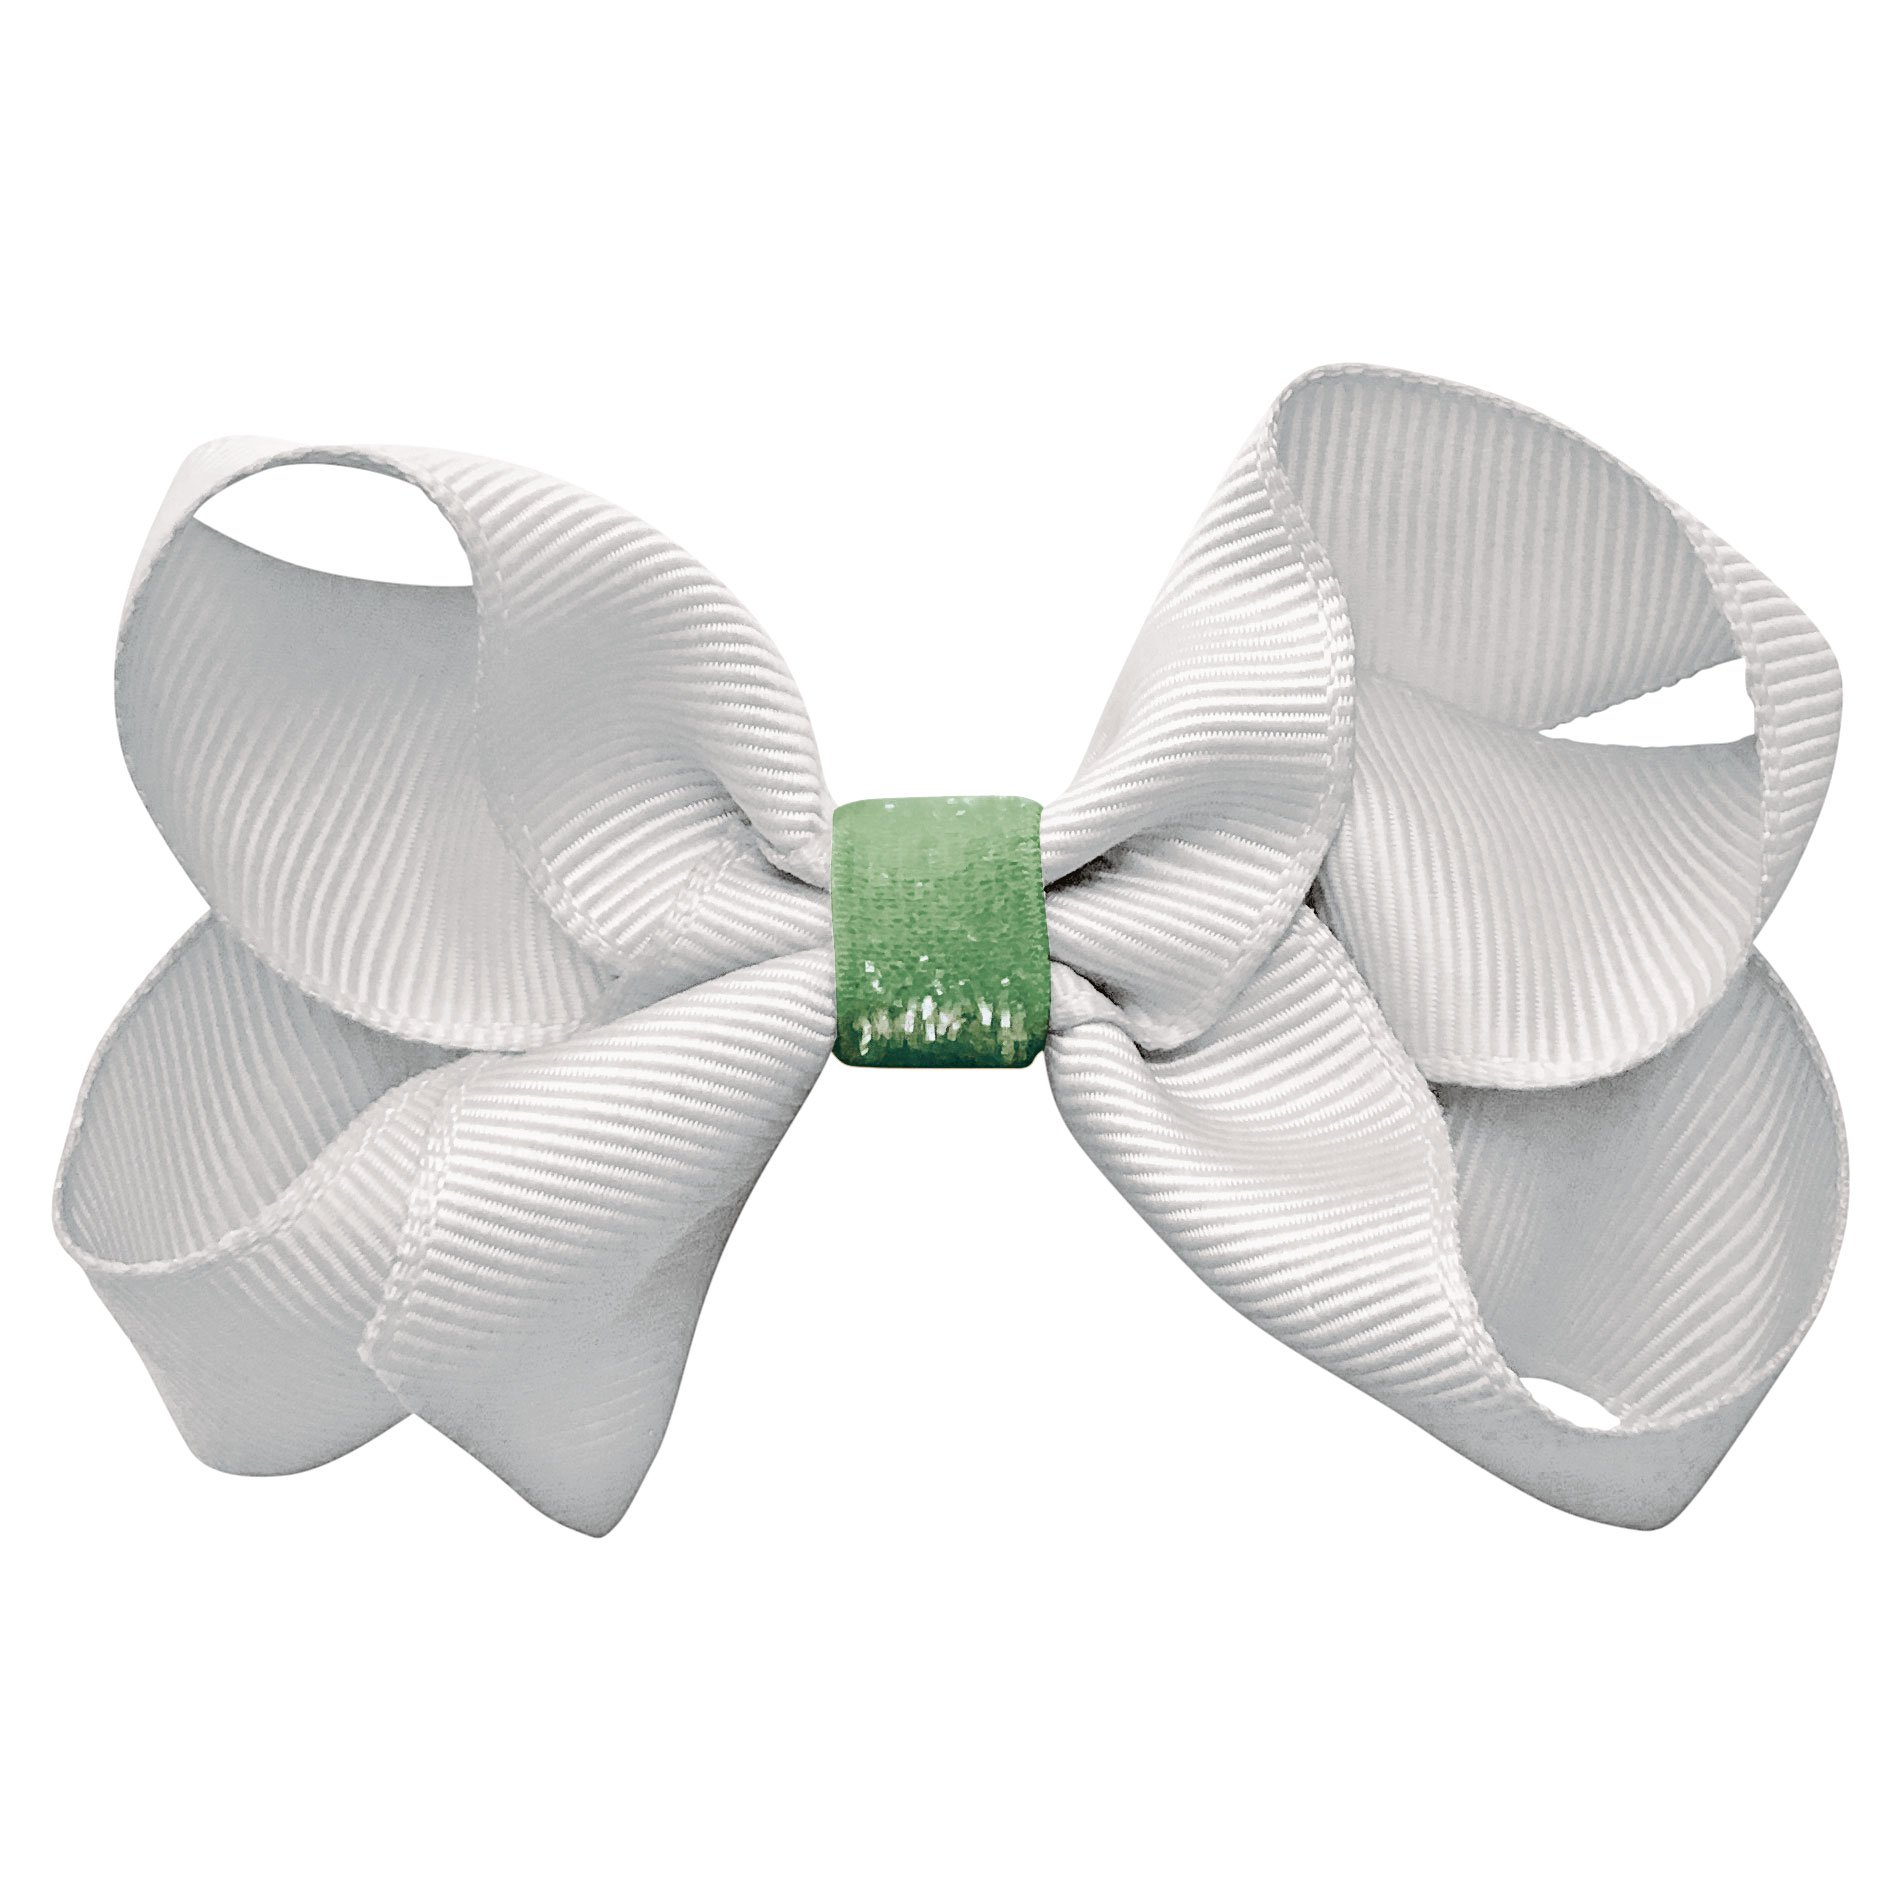 Medium boutique bow - alligator clip - white / bud green colored glitter middle